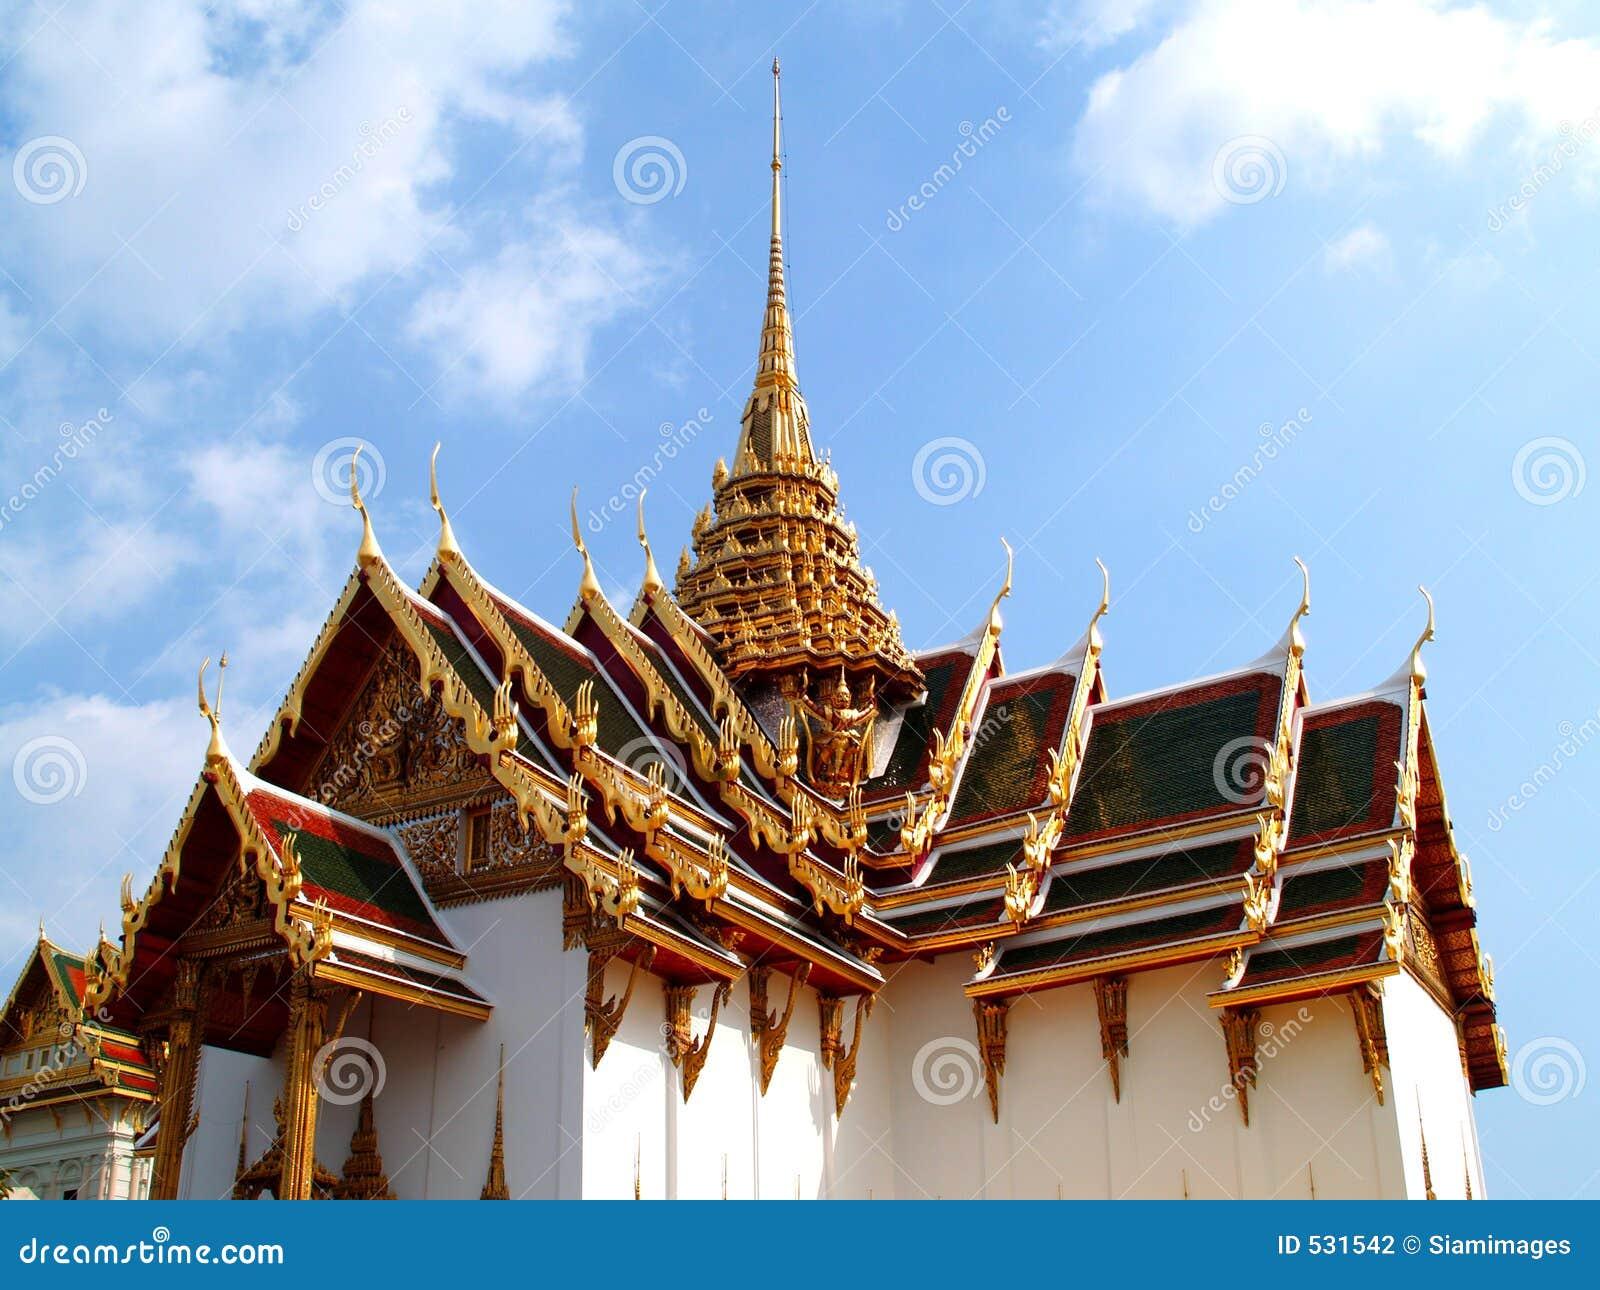 Estilo da arquitetura de Tailândia